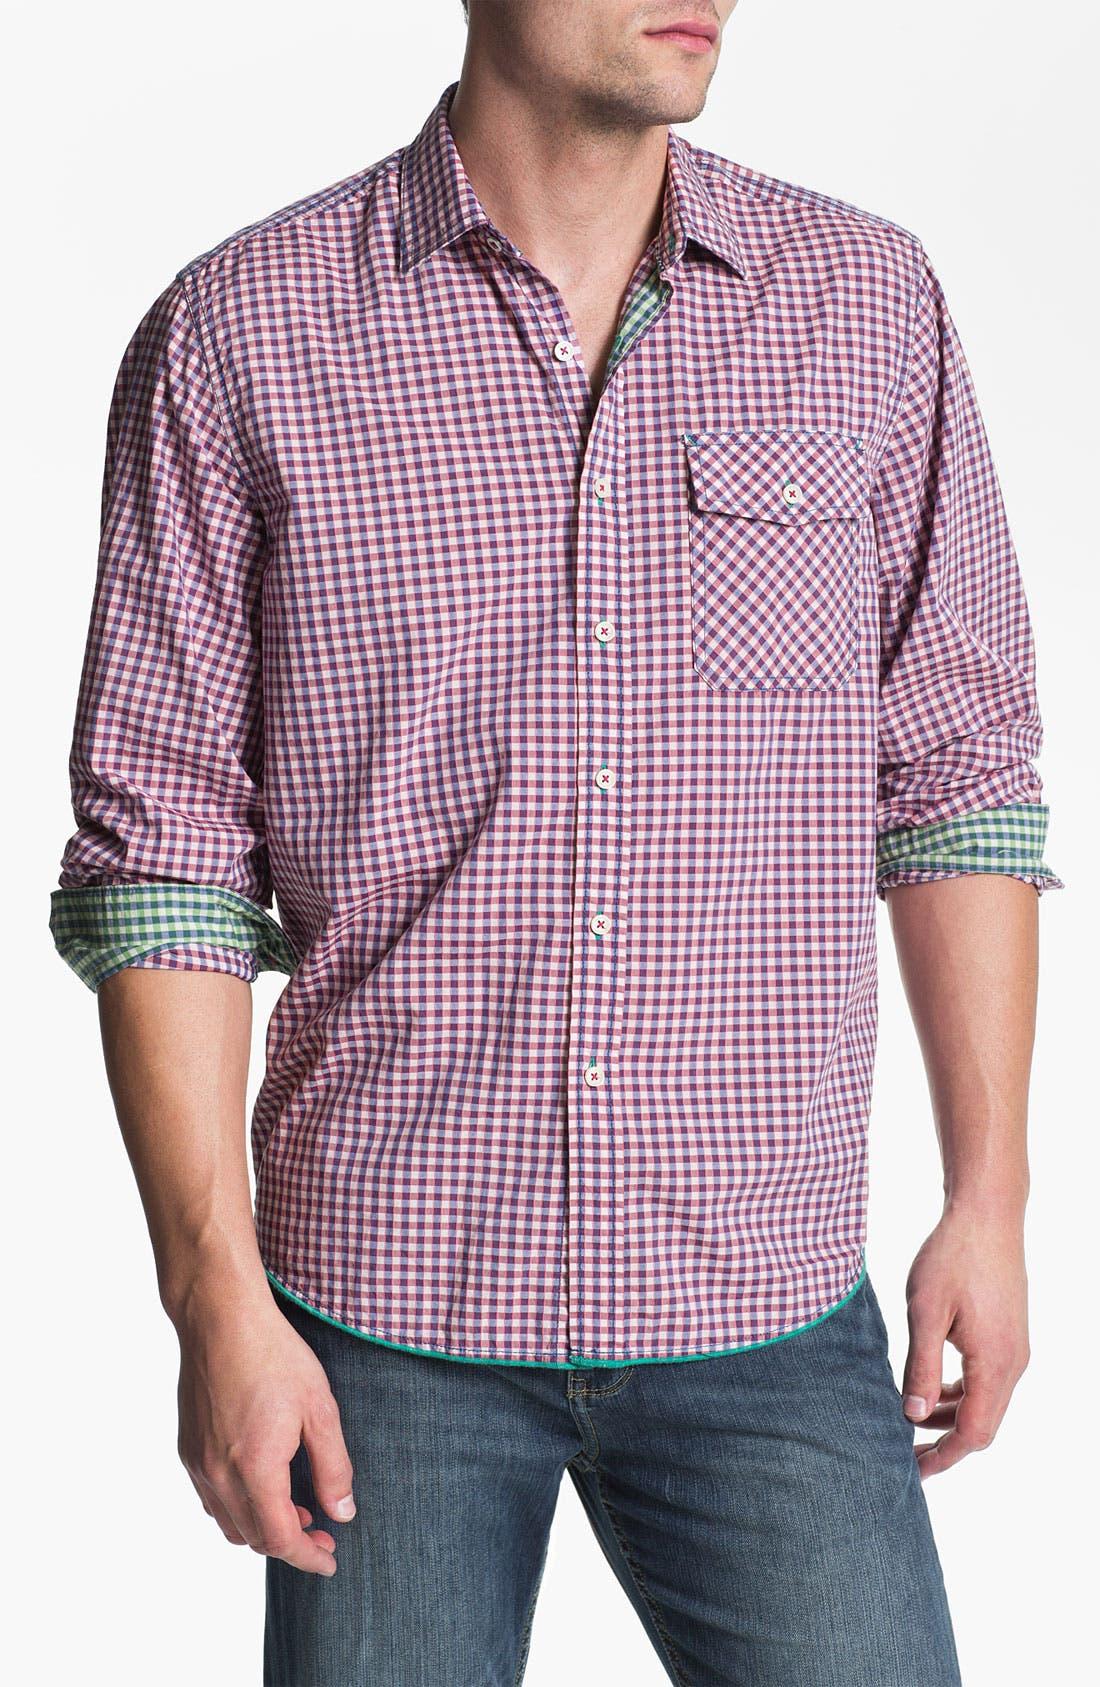 Alternate Image 1 Selected - Tommy Bahama Denim 'Cape Check' Sport Shirt